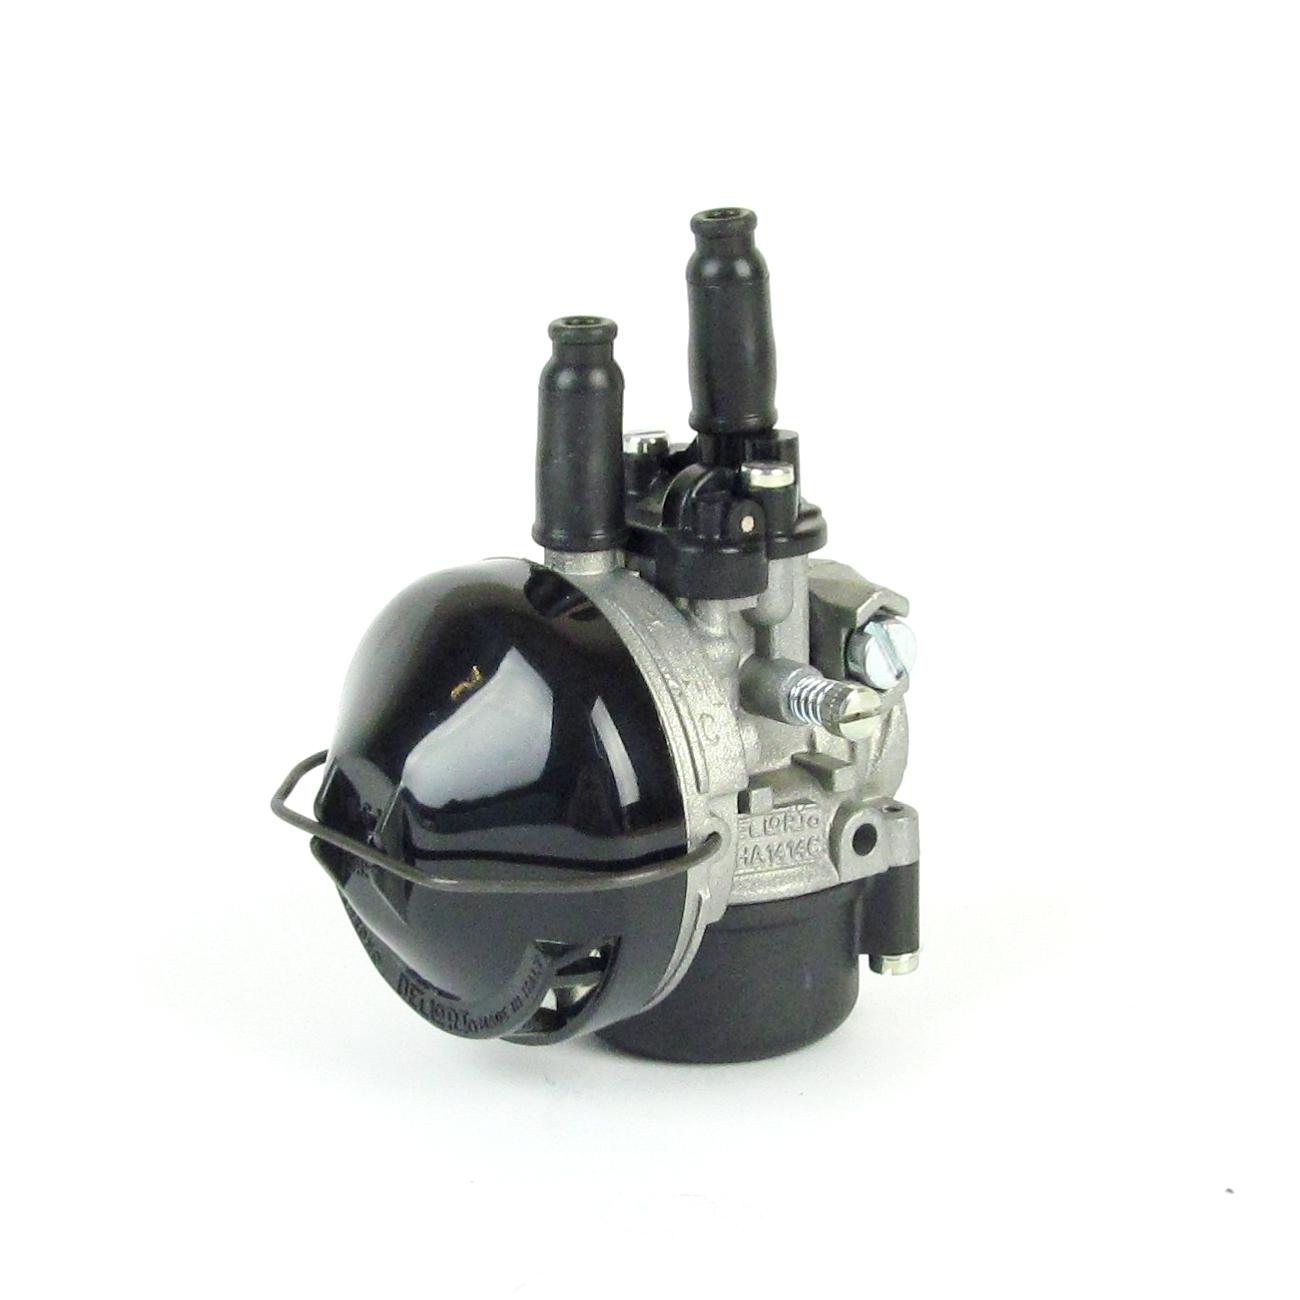 DELLORTO SHA14.14C CARB QT50 / MINARELLI / Томош / MOTOBECANE / PUCH / MAXI